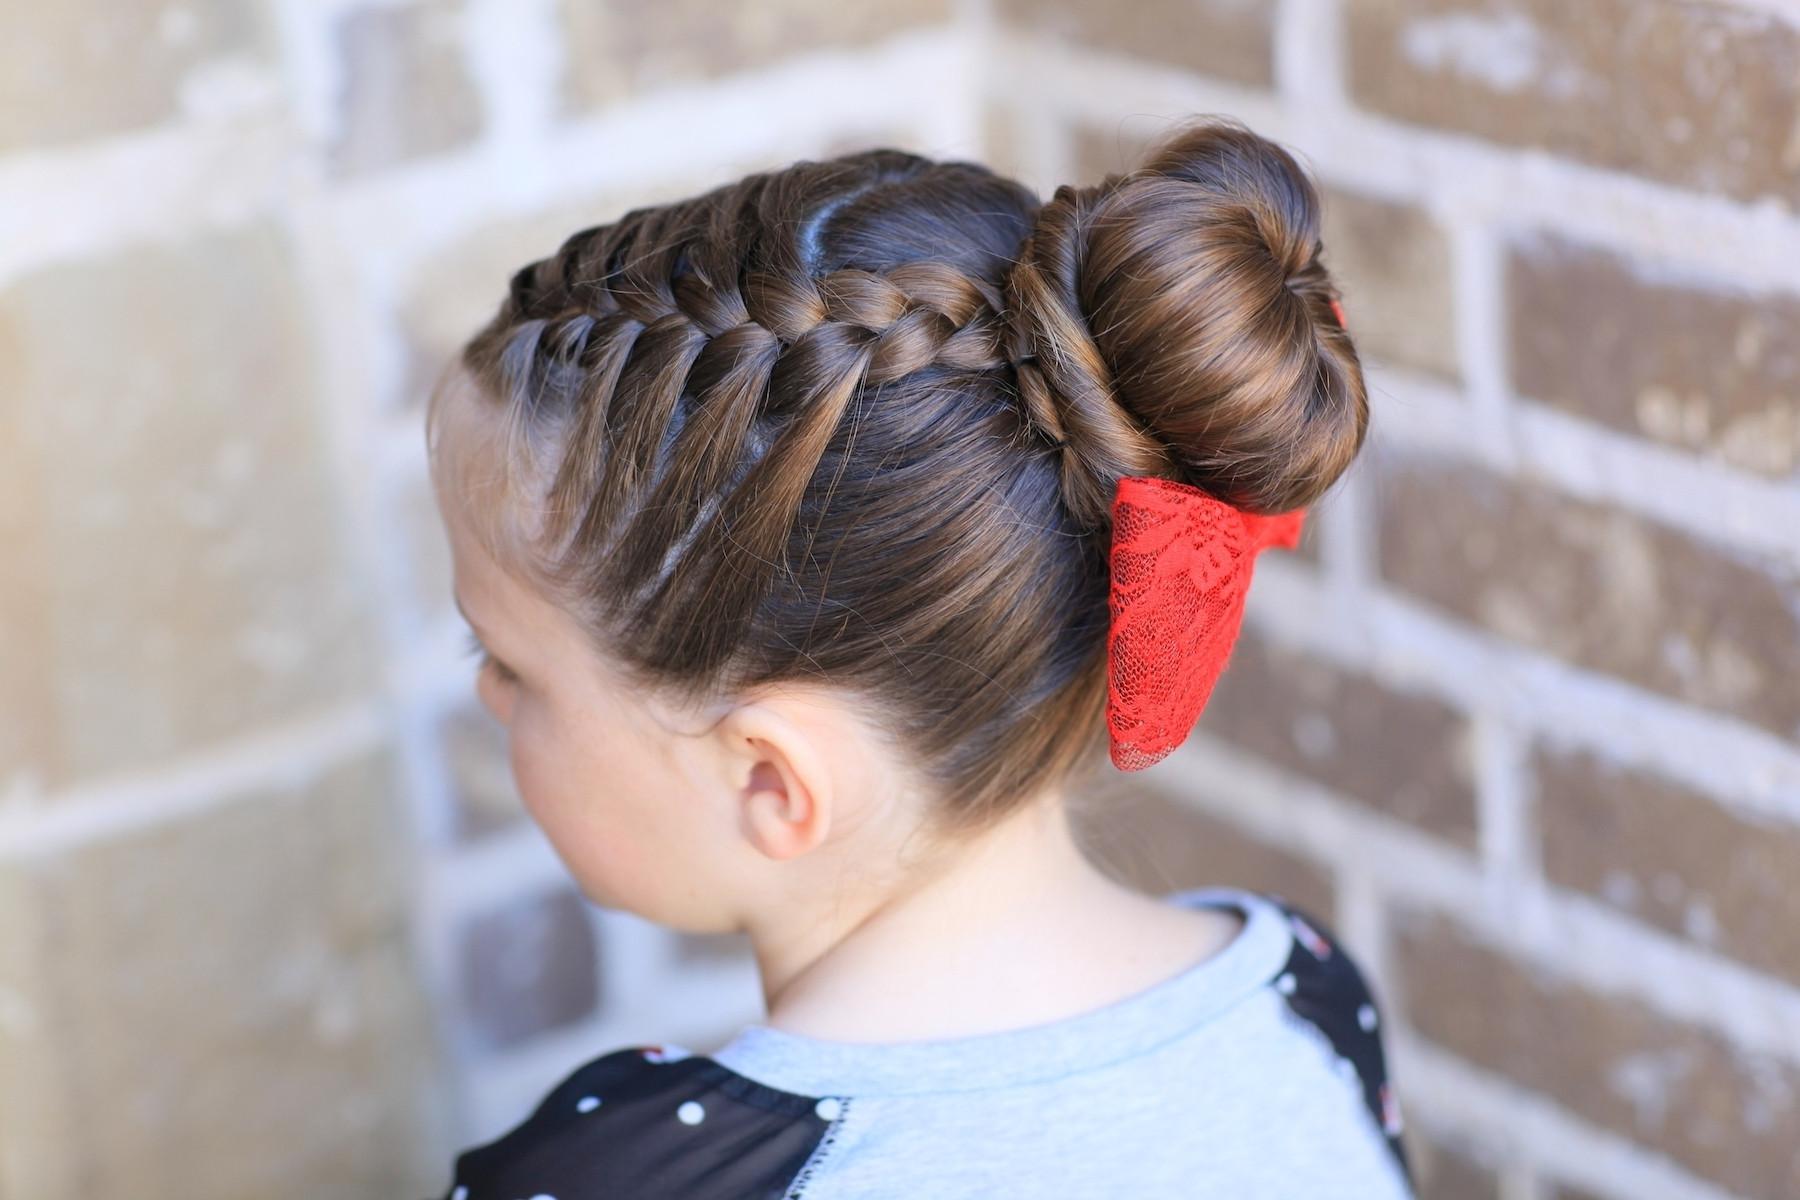 Cute Gymnastics Hairstyles  gymnastics peion hairstyles Hairstyles By Unixcode